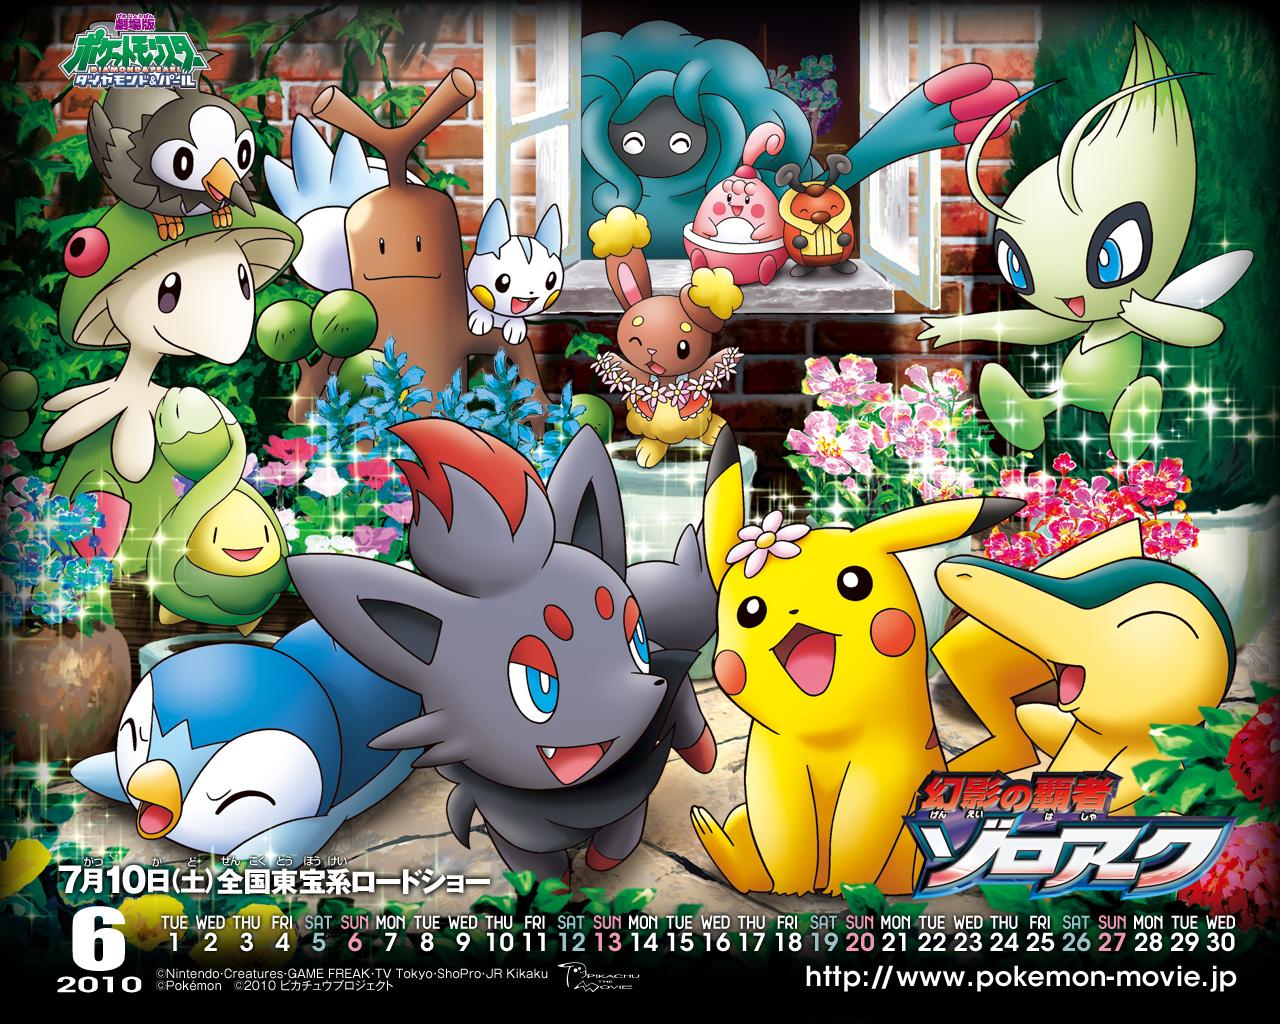 Darkrai 39 s Hideout Pokemon 2010